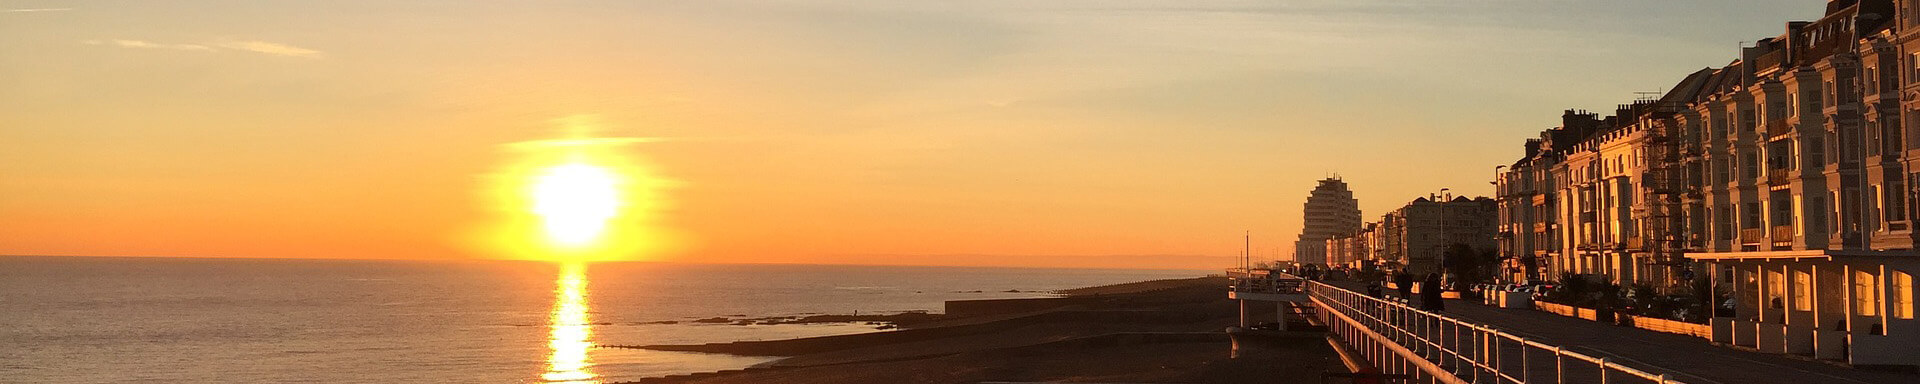 Rundreise Großbritannien Southampton Sonnenuntergang